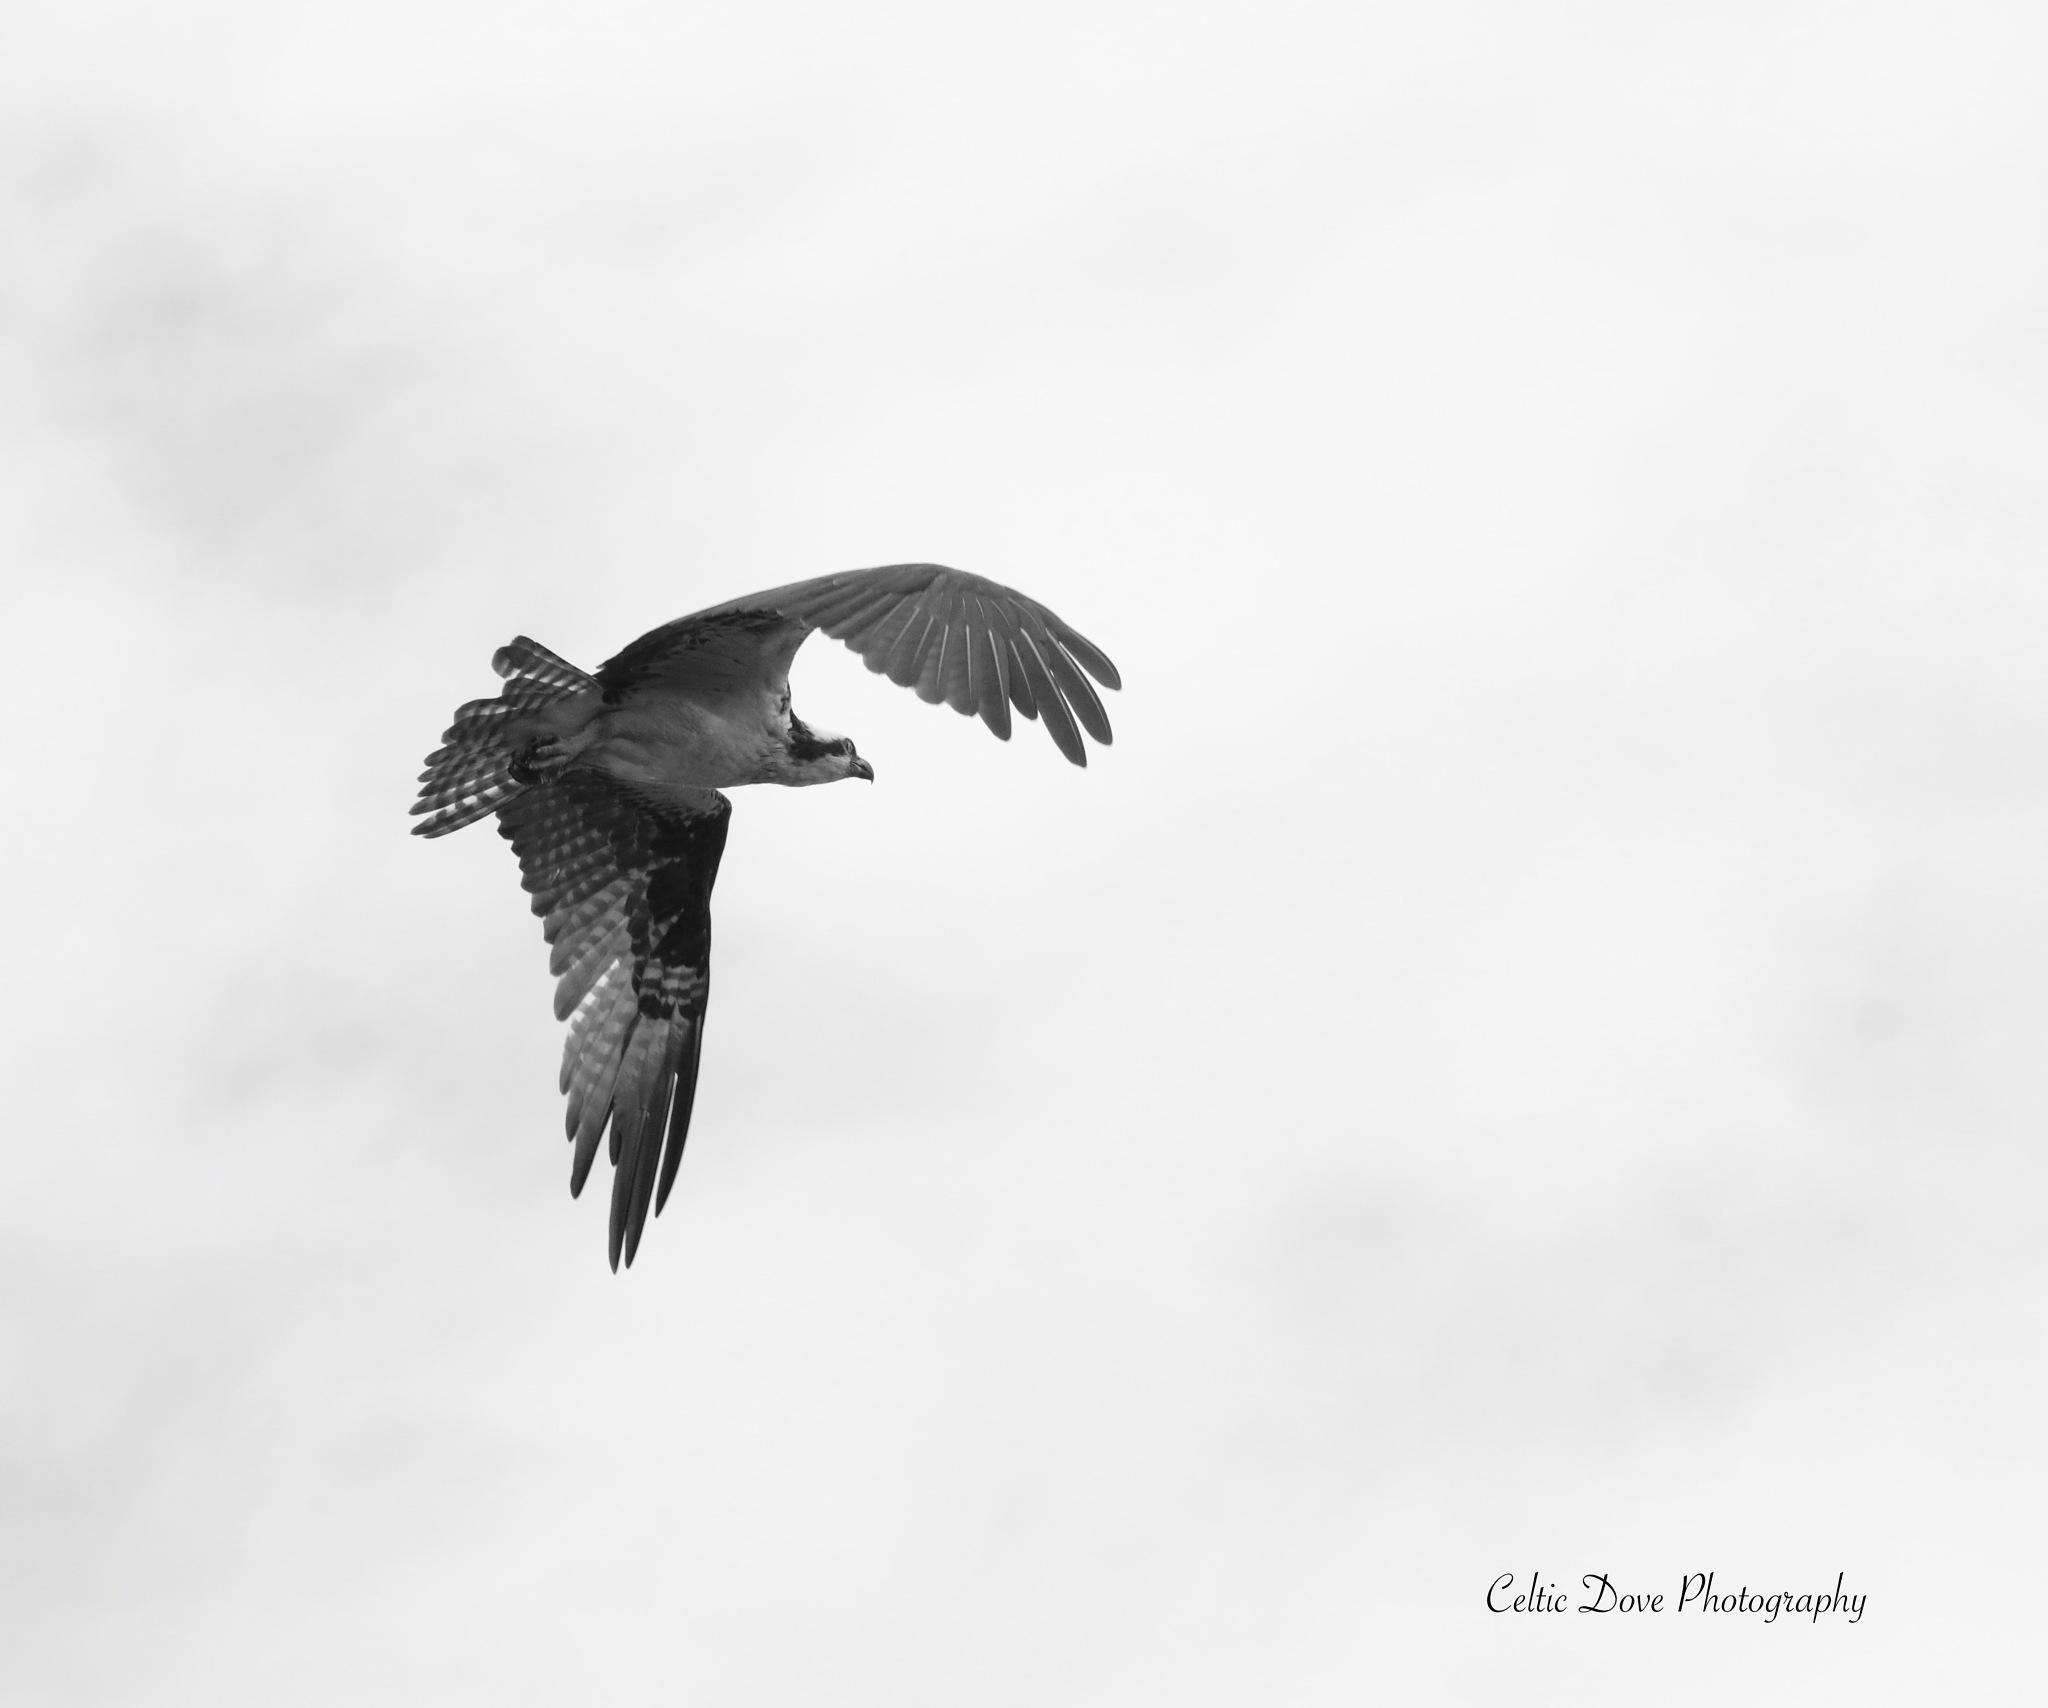 An Osprey In Flight by CelticDove